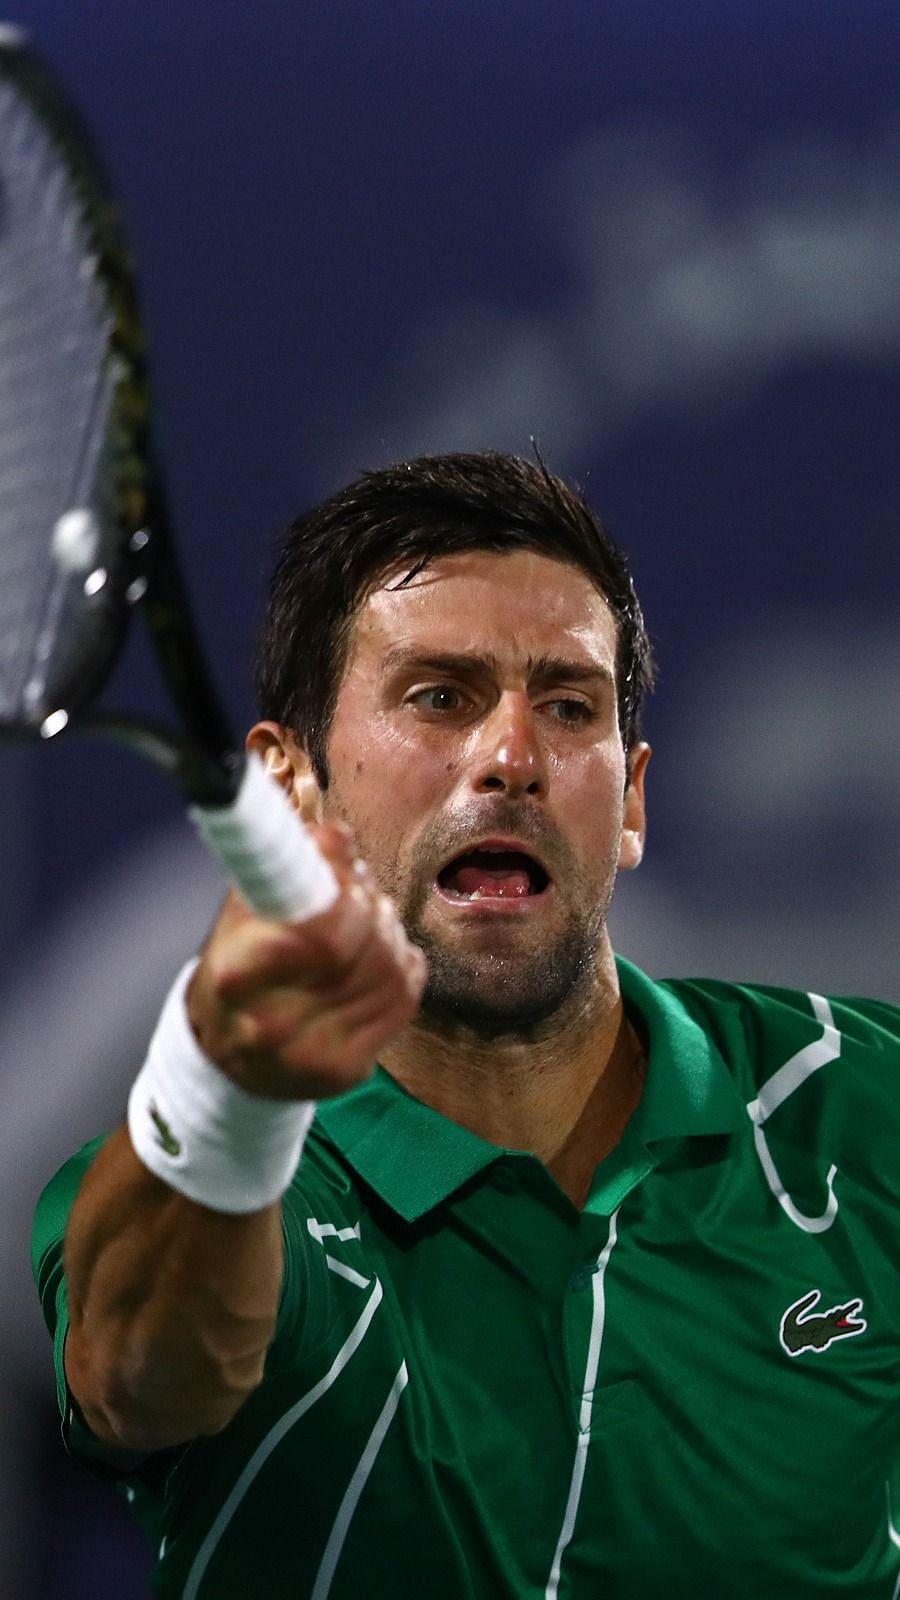 Atp Dubai Tennis Championships Novak Djokovic Vs Gael Monfils Semi Final Where To Watch And Live Stream Details